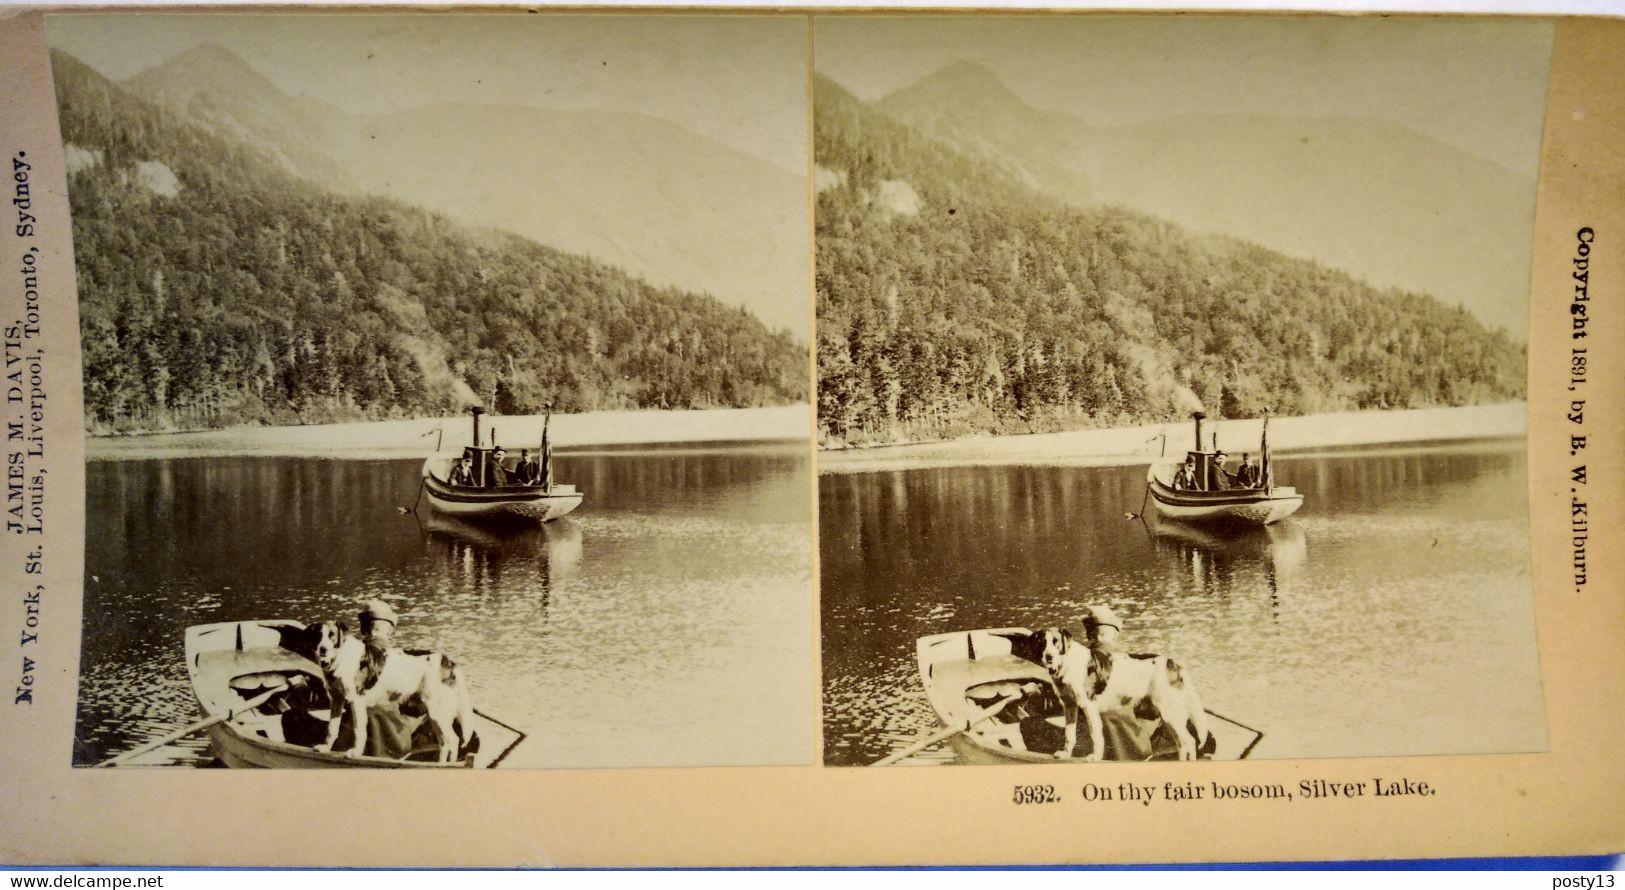 PHOTO STÉRÉO USA Fin XIX ème - Silver Lake - Bateaux - Chien - Photo James M. Davis - Stereo-Photographie